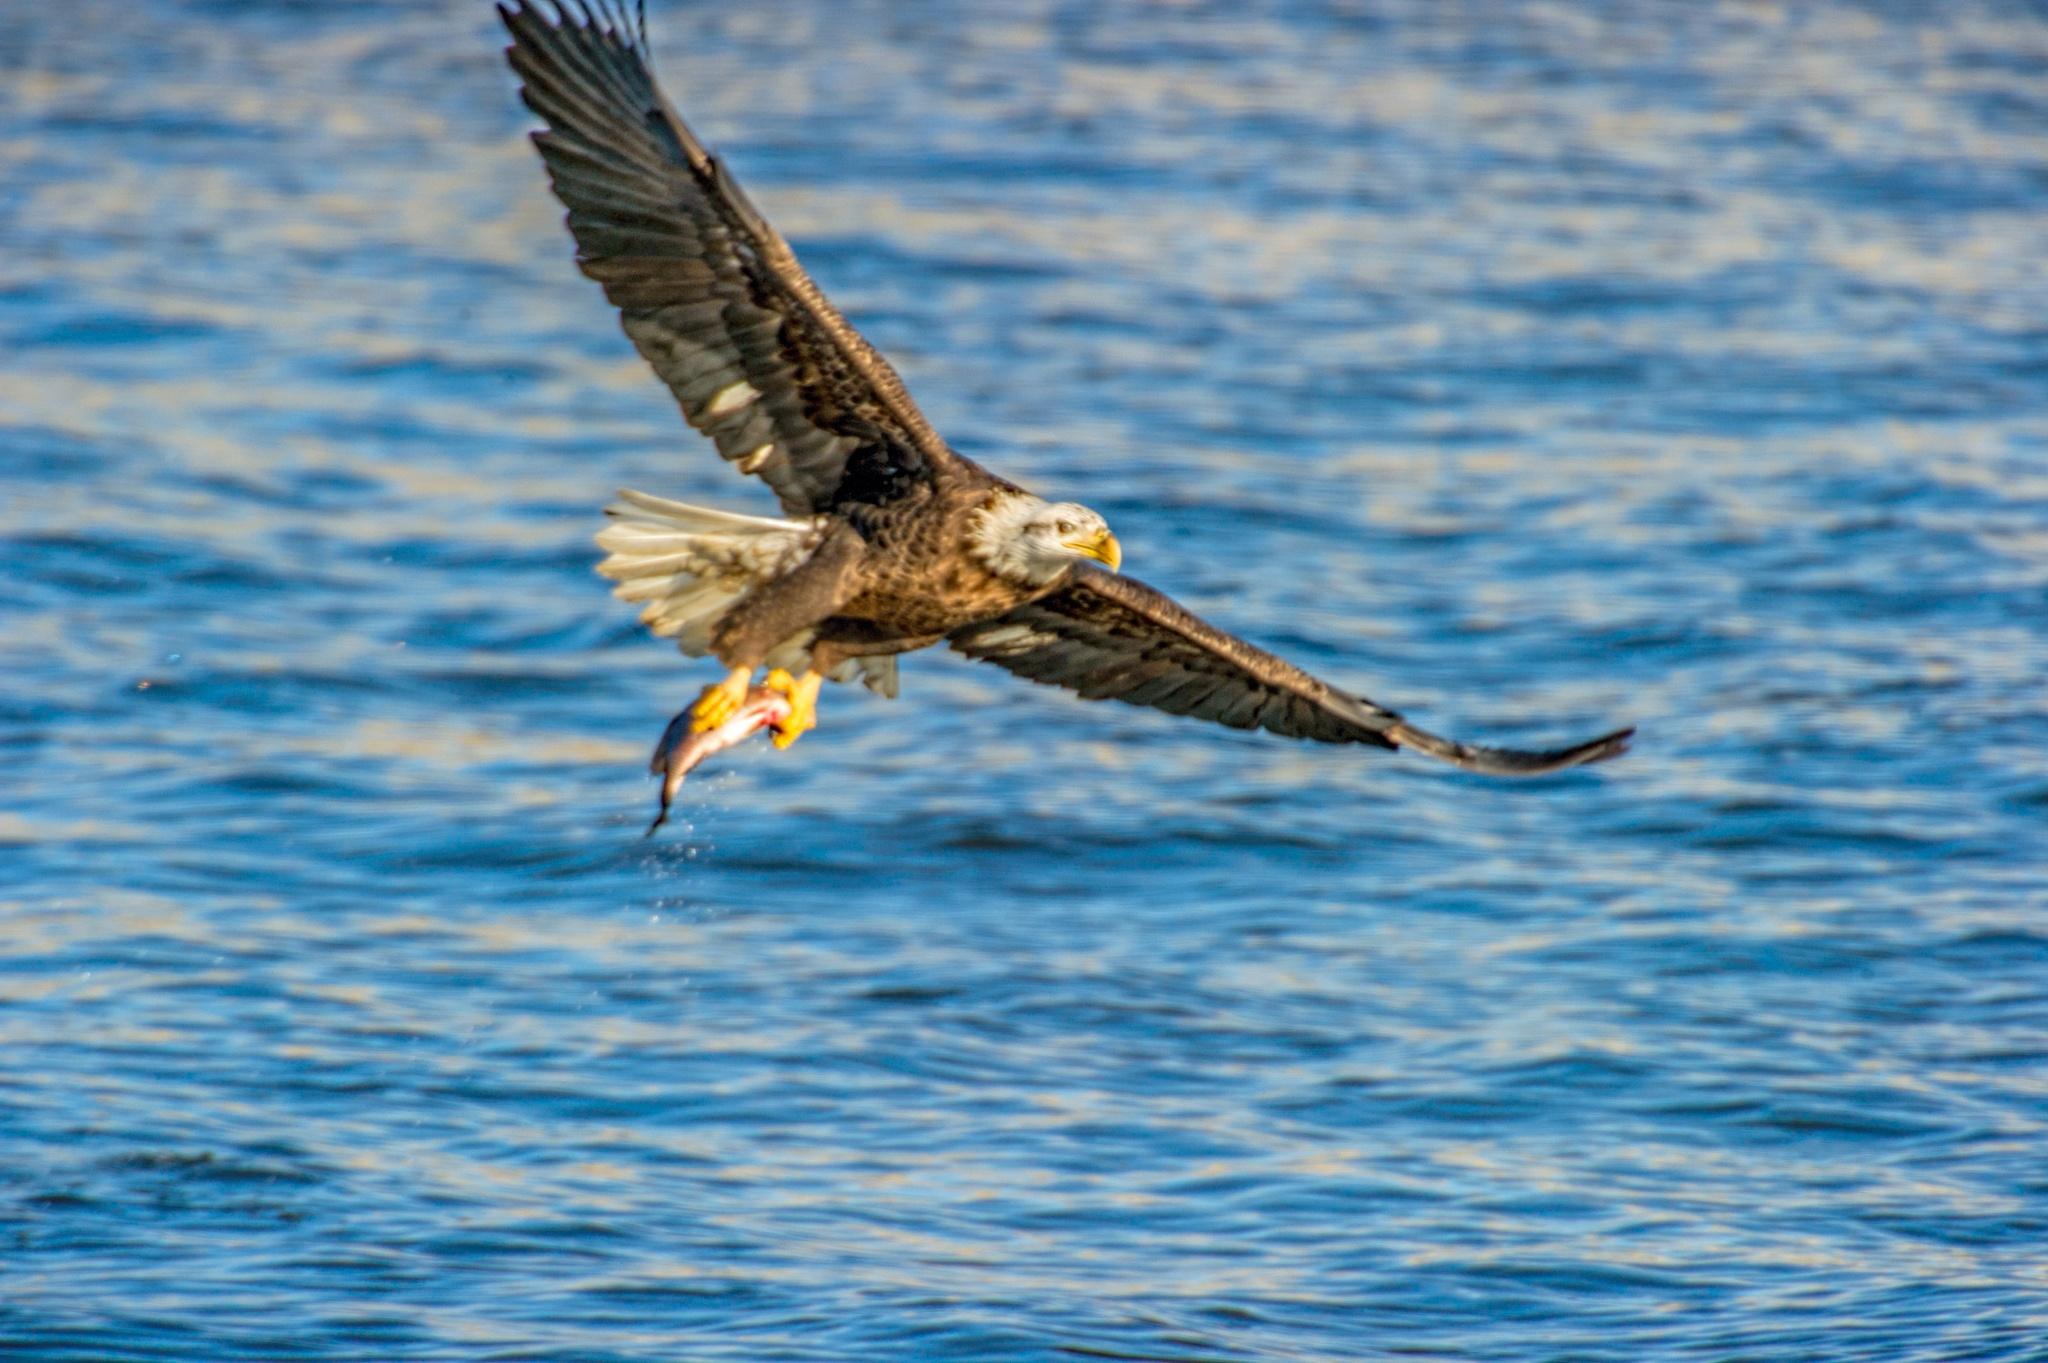 Fishing by David Neesley